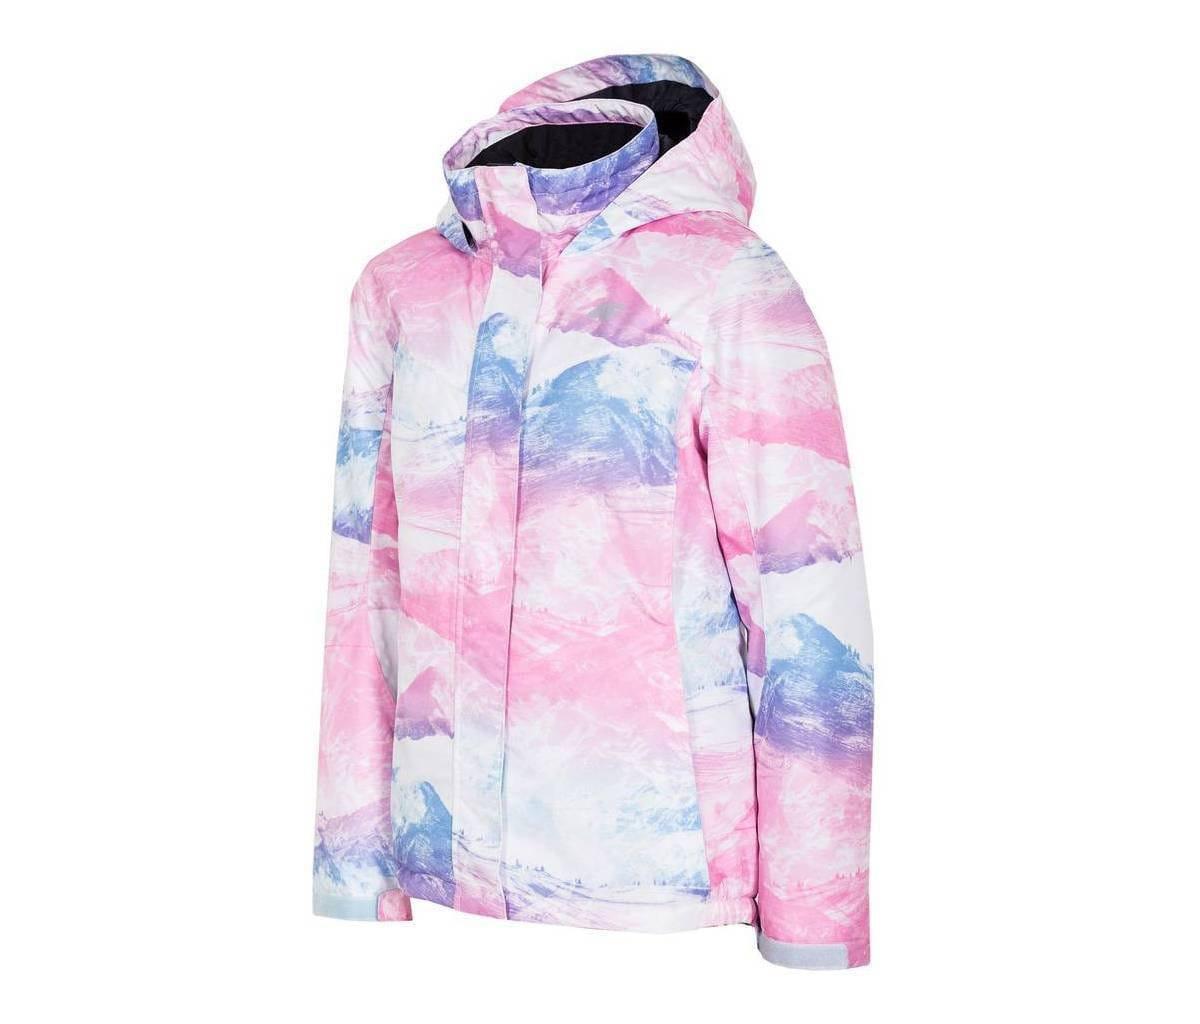 Bundy 4F Girl's ski jacket JKUDN402B